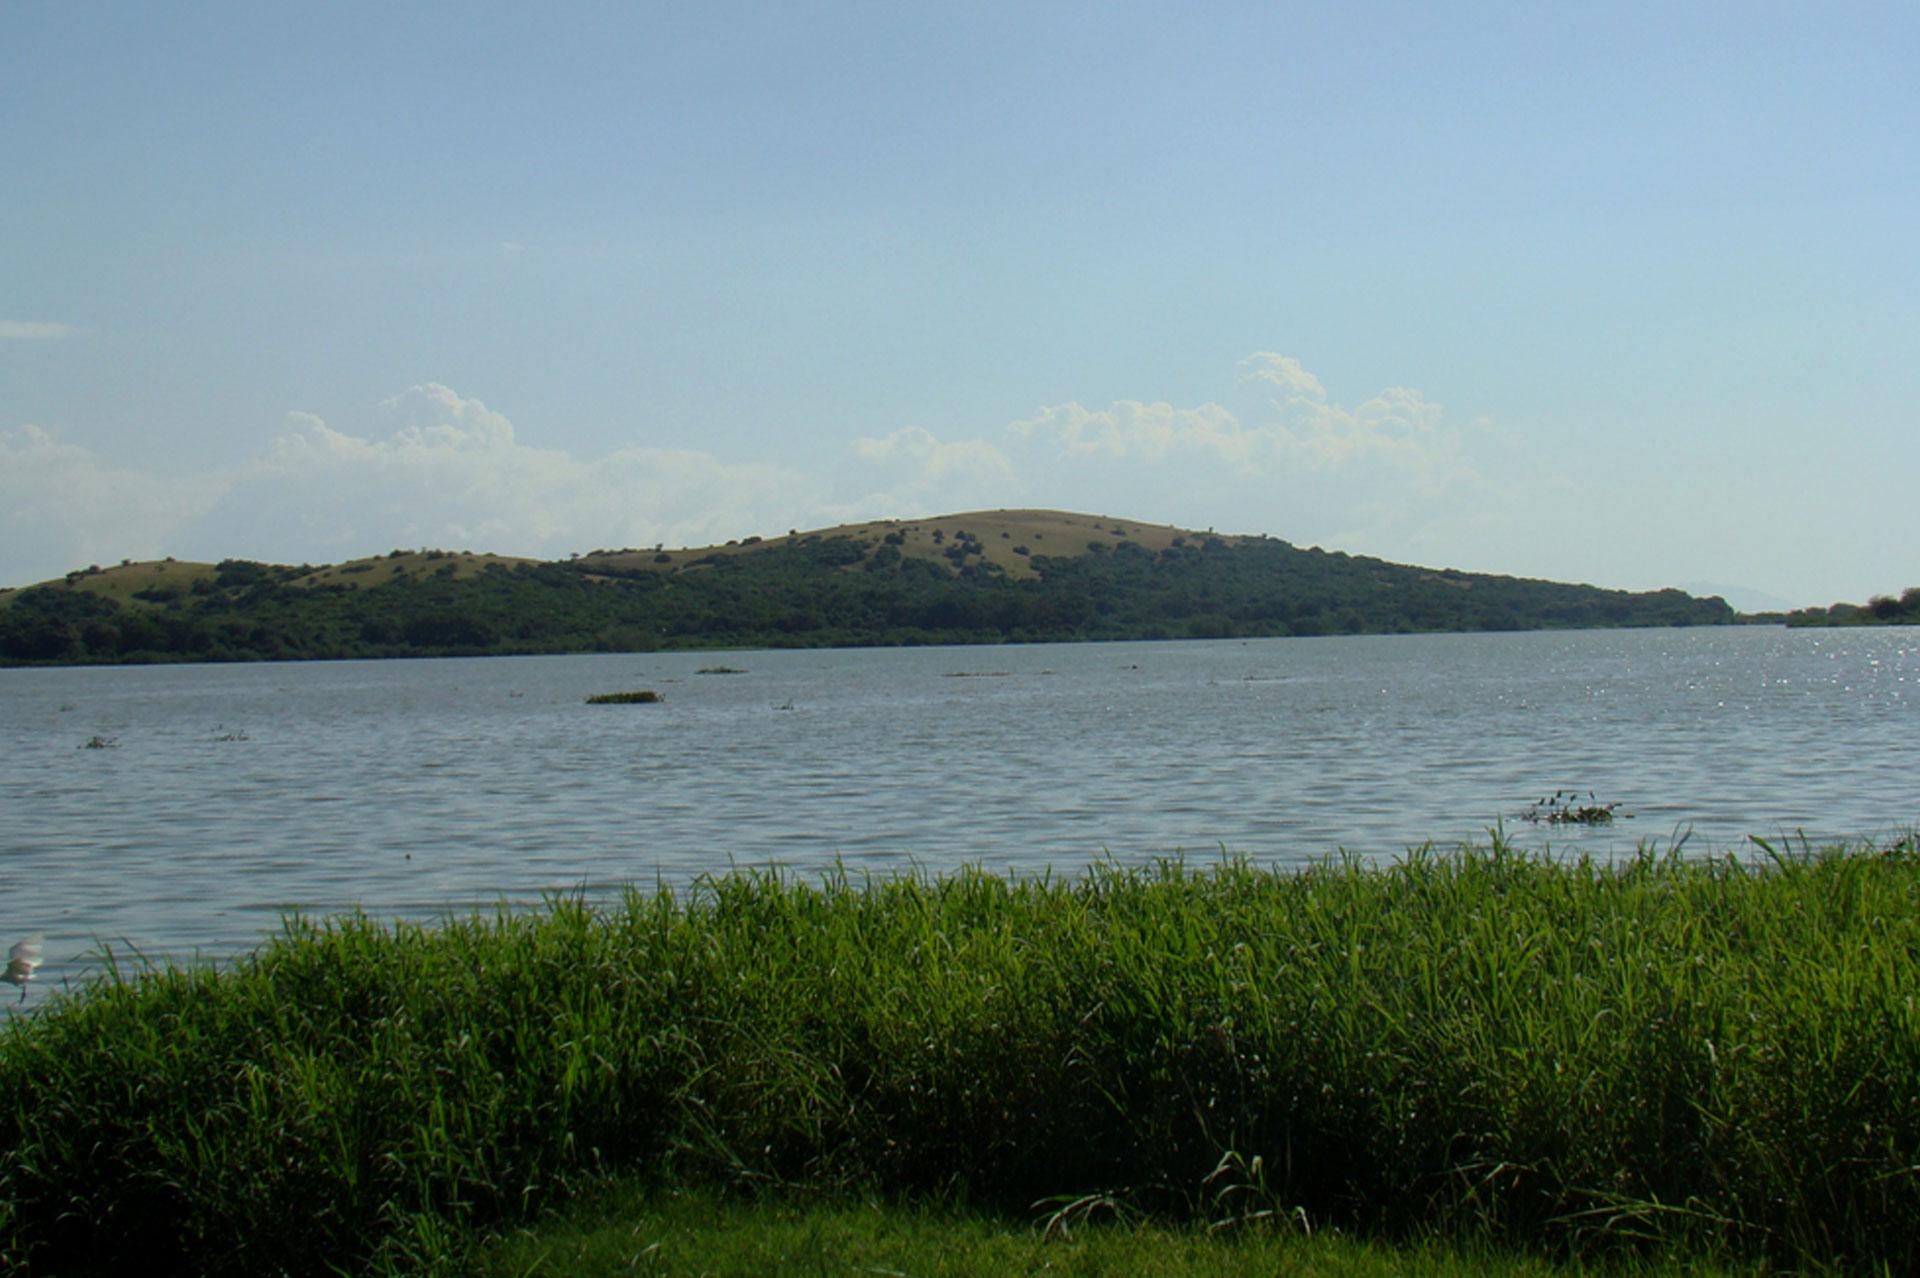 Diani_travel_center_National_parks_in_kenya_Ndere_National_park_image_3